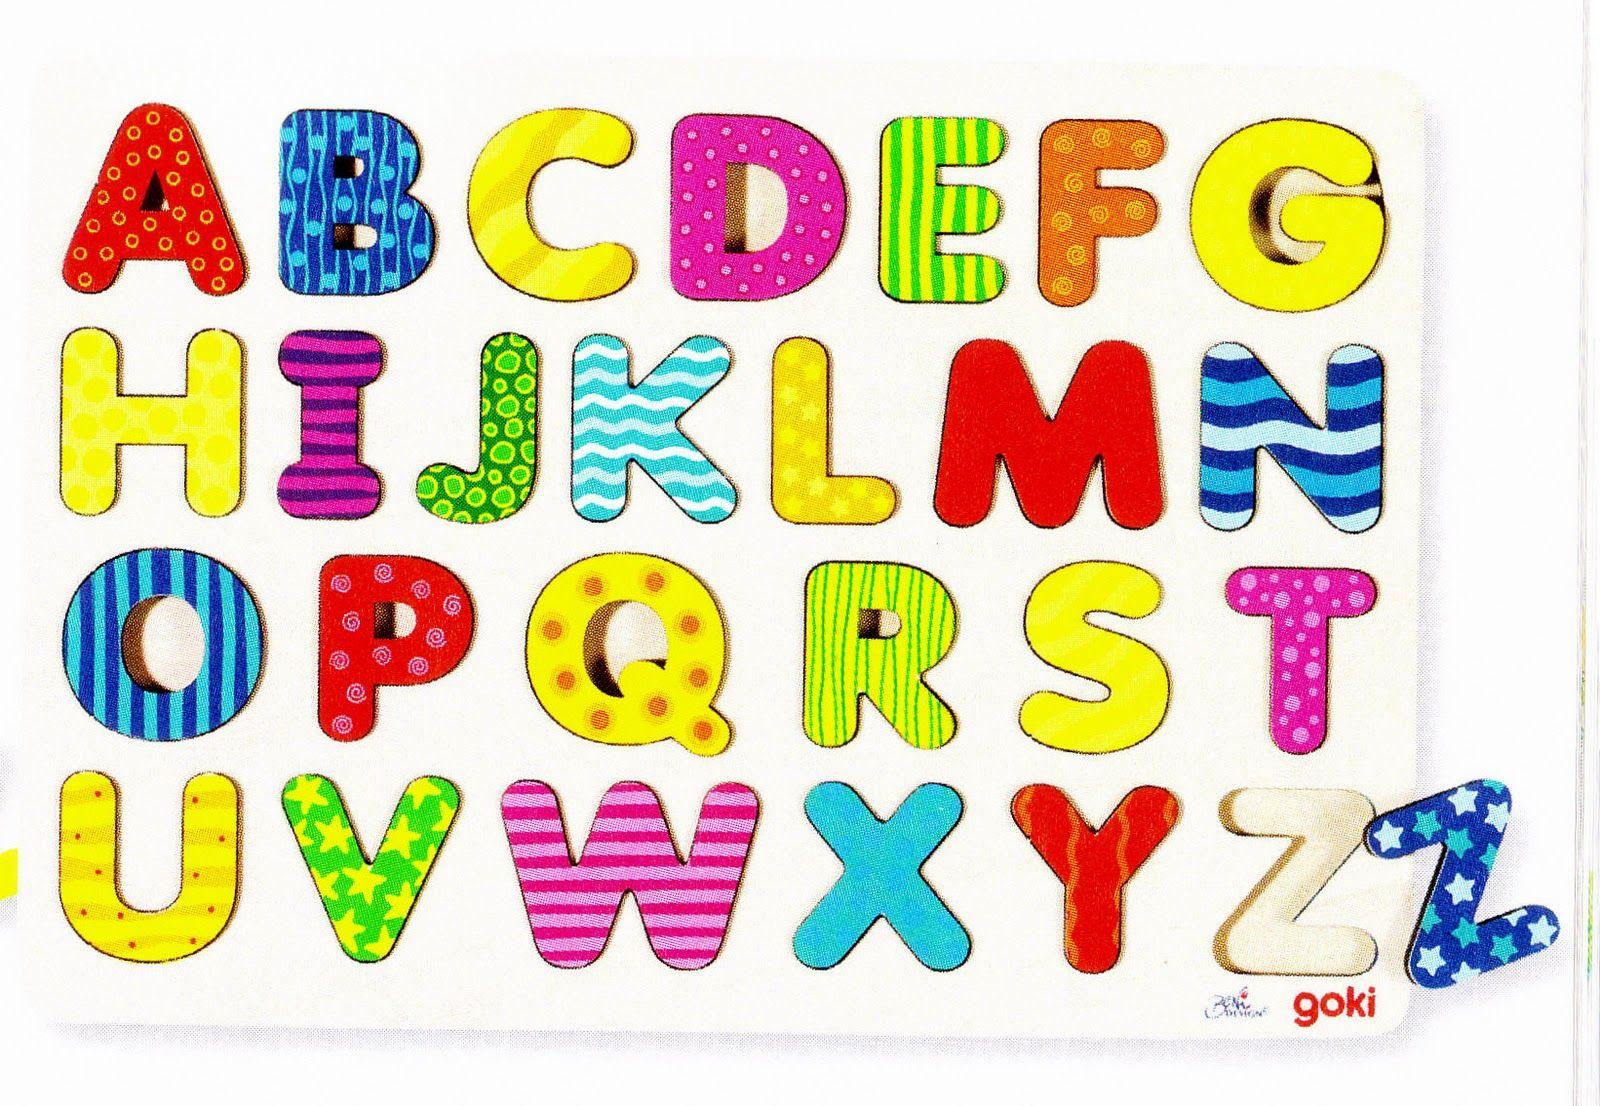 Letras decoradas para imprimir buscar con google ni os - Letras decorativas para ninos ...